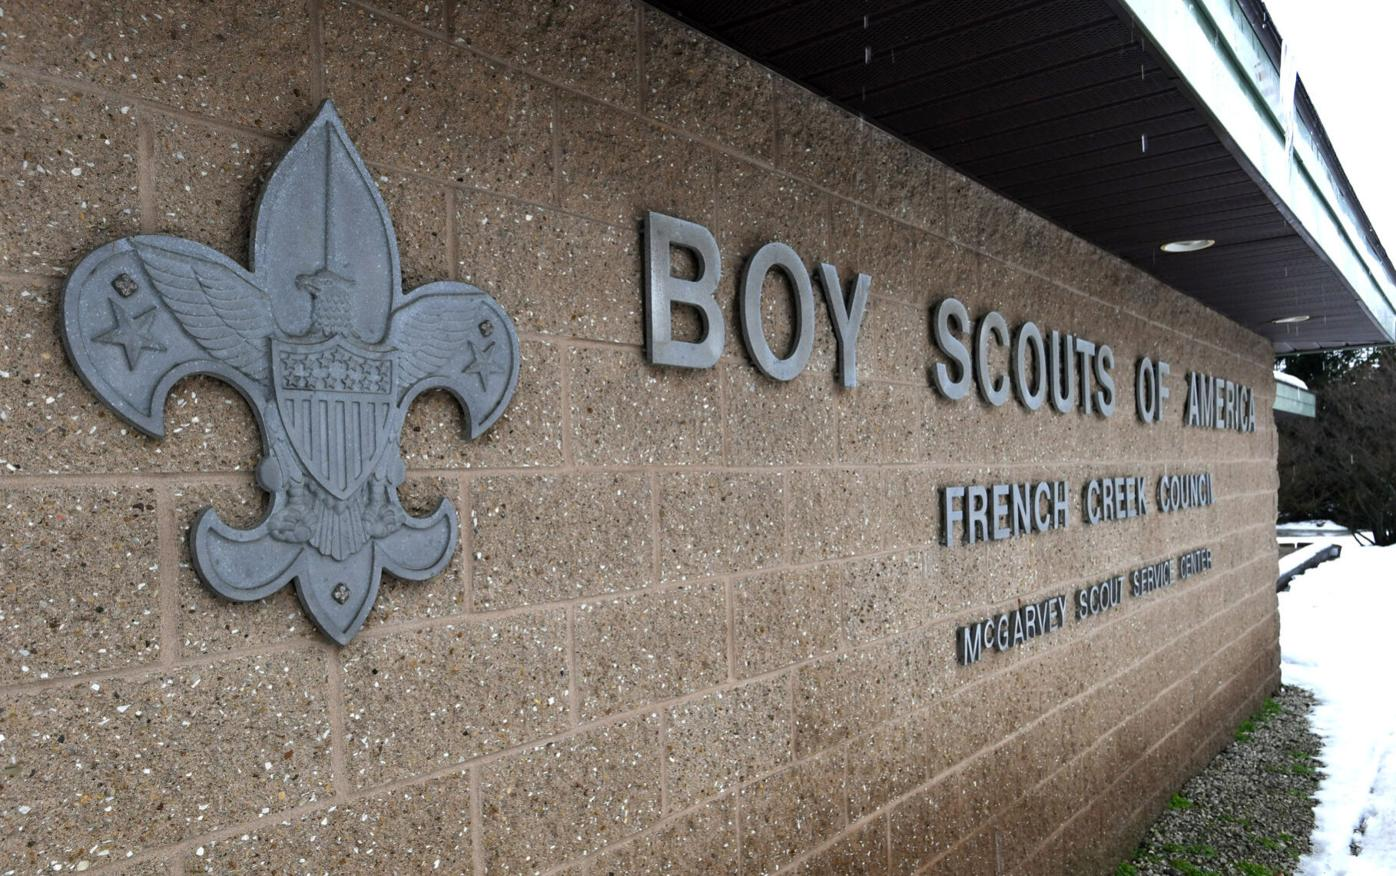 Boy Scouts-Bankruptcy